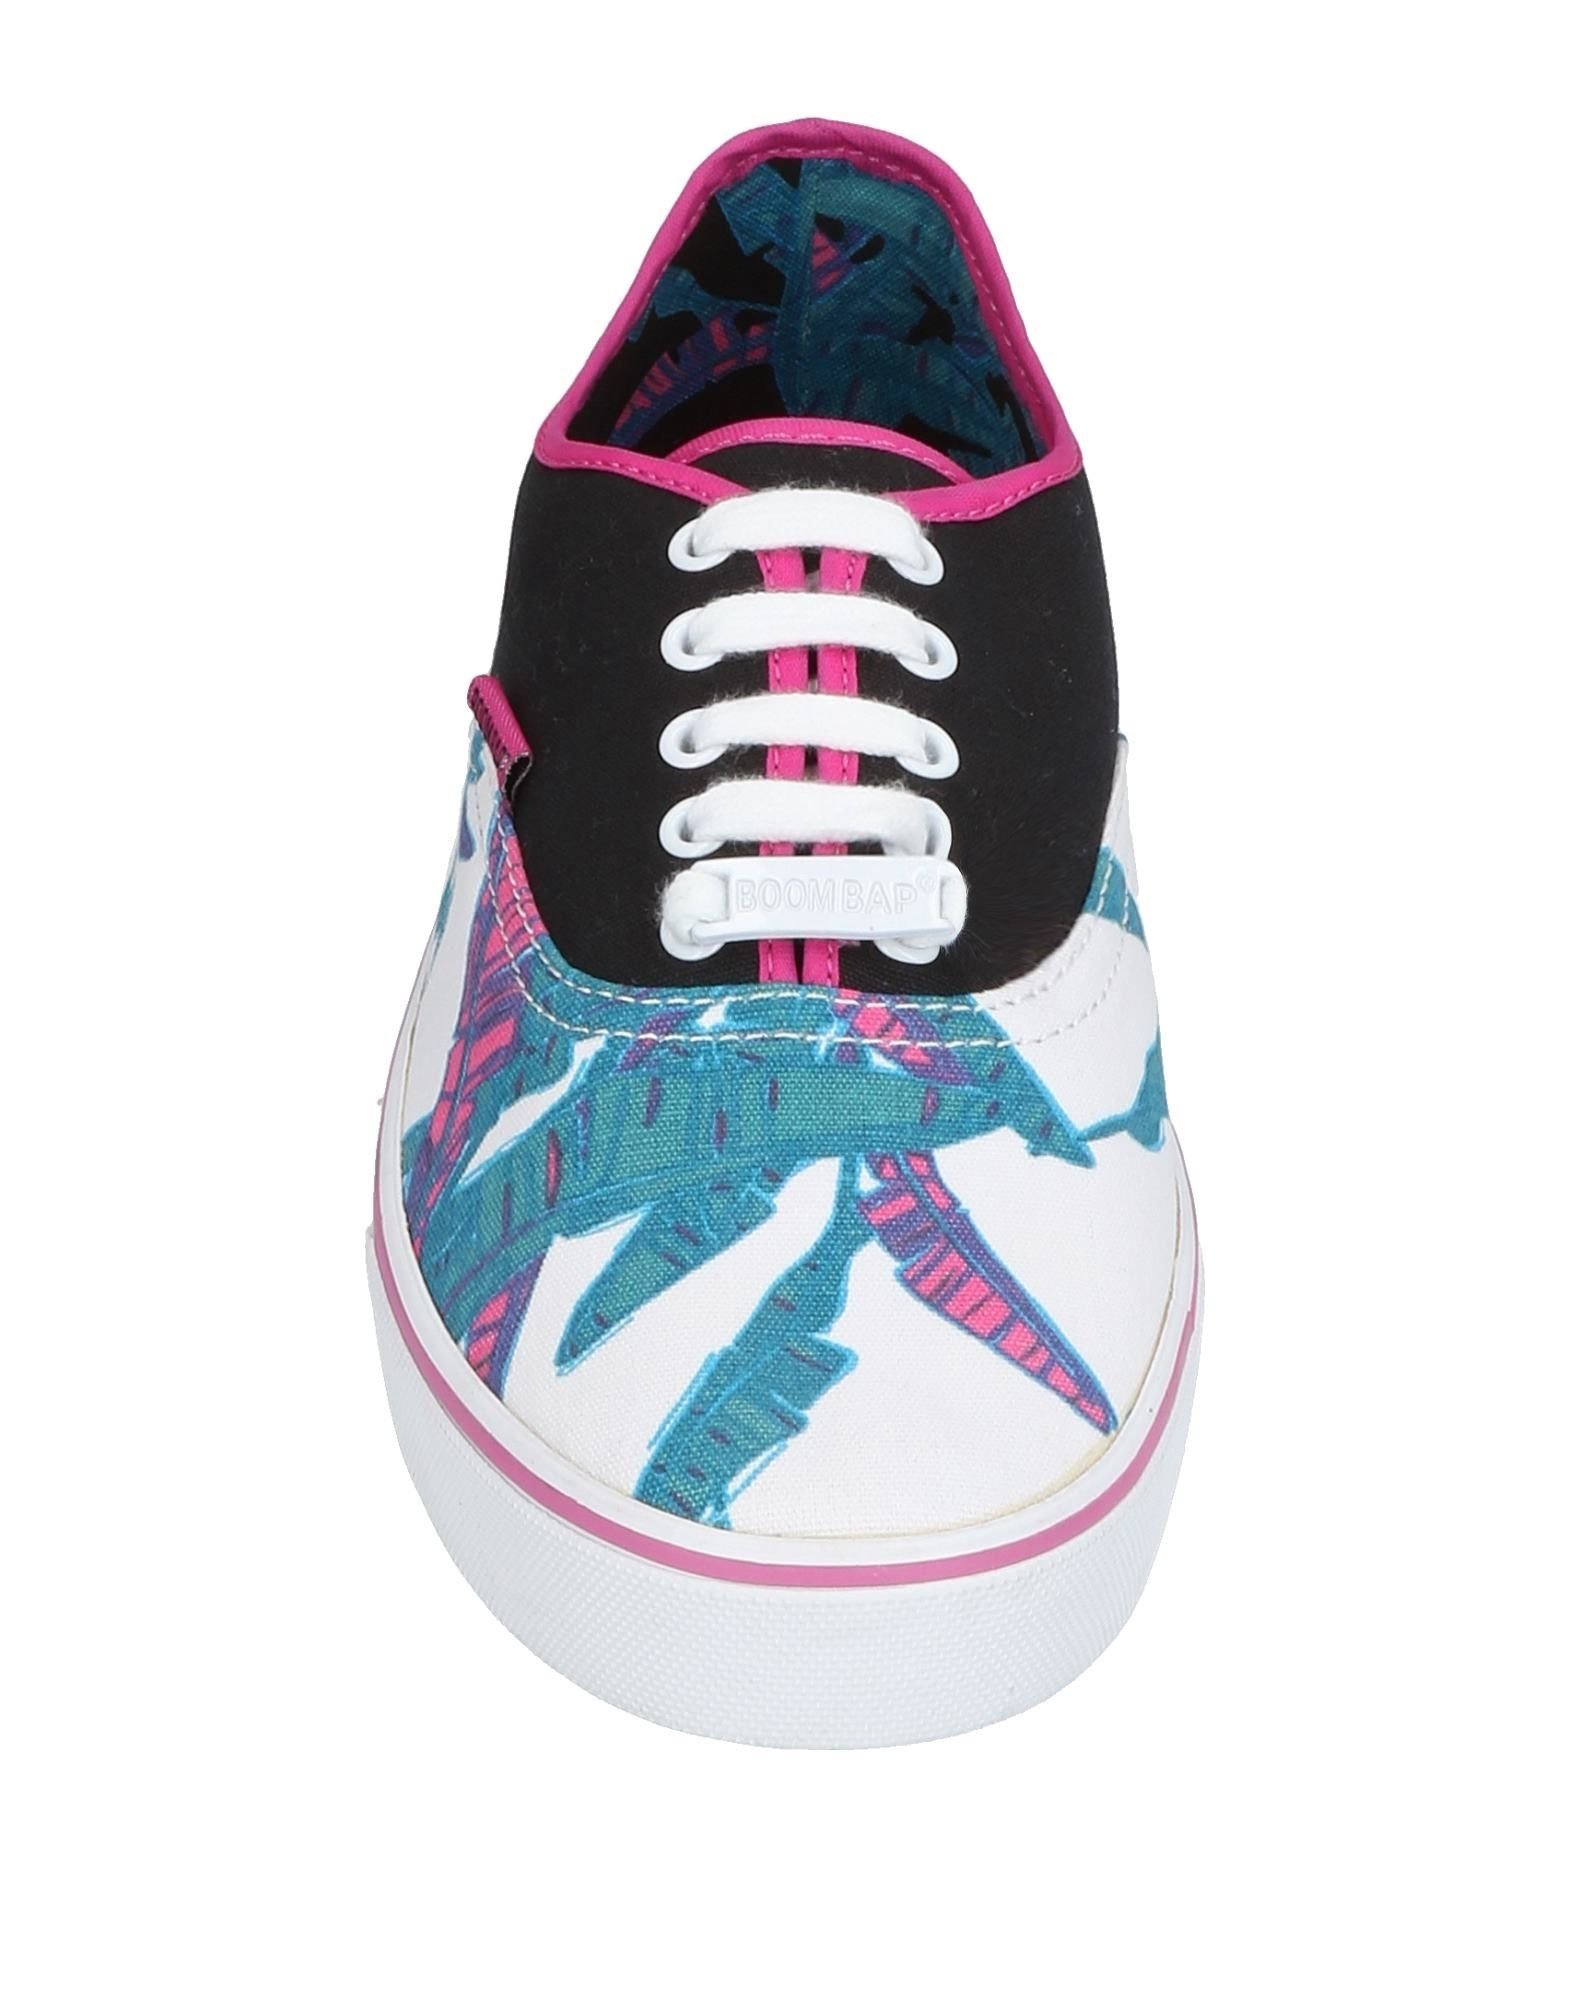 Moda Sneakers Sneakers Moda Boombap Donna - 11425050AB a5a386